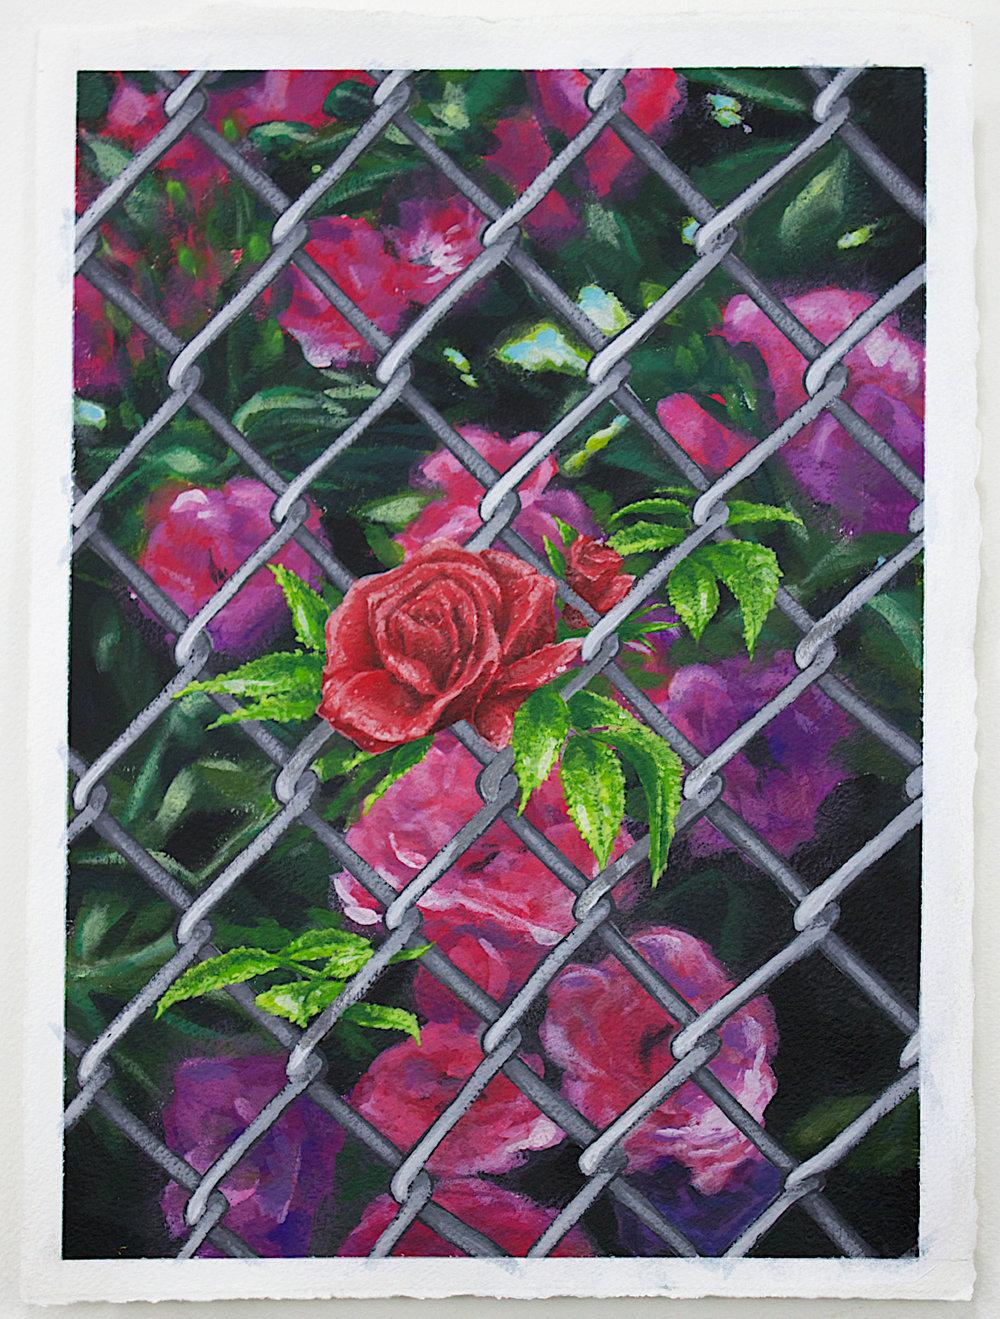 Rose Garden, 2018